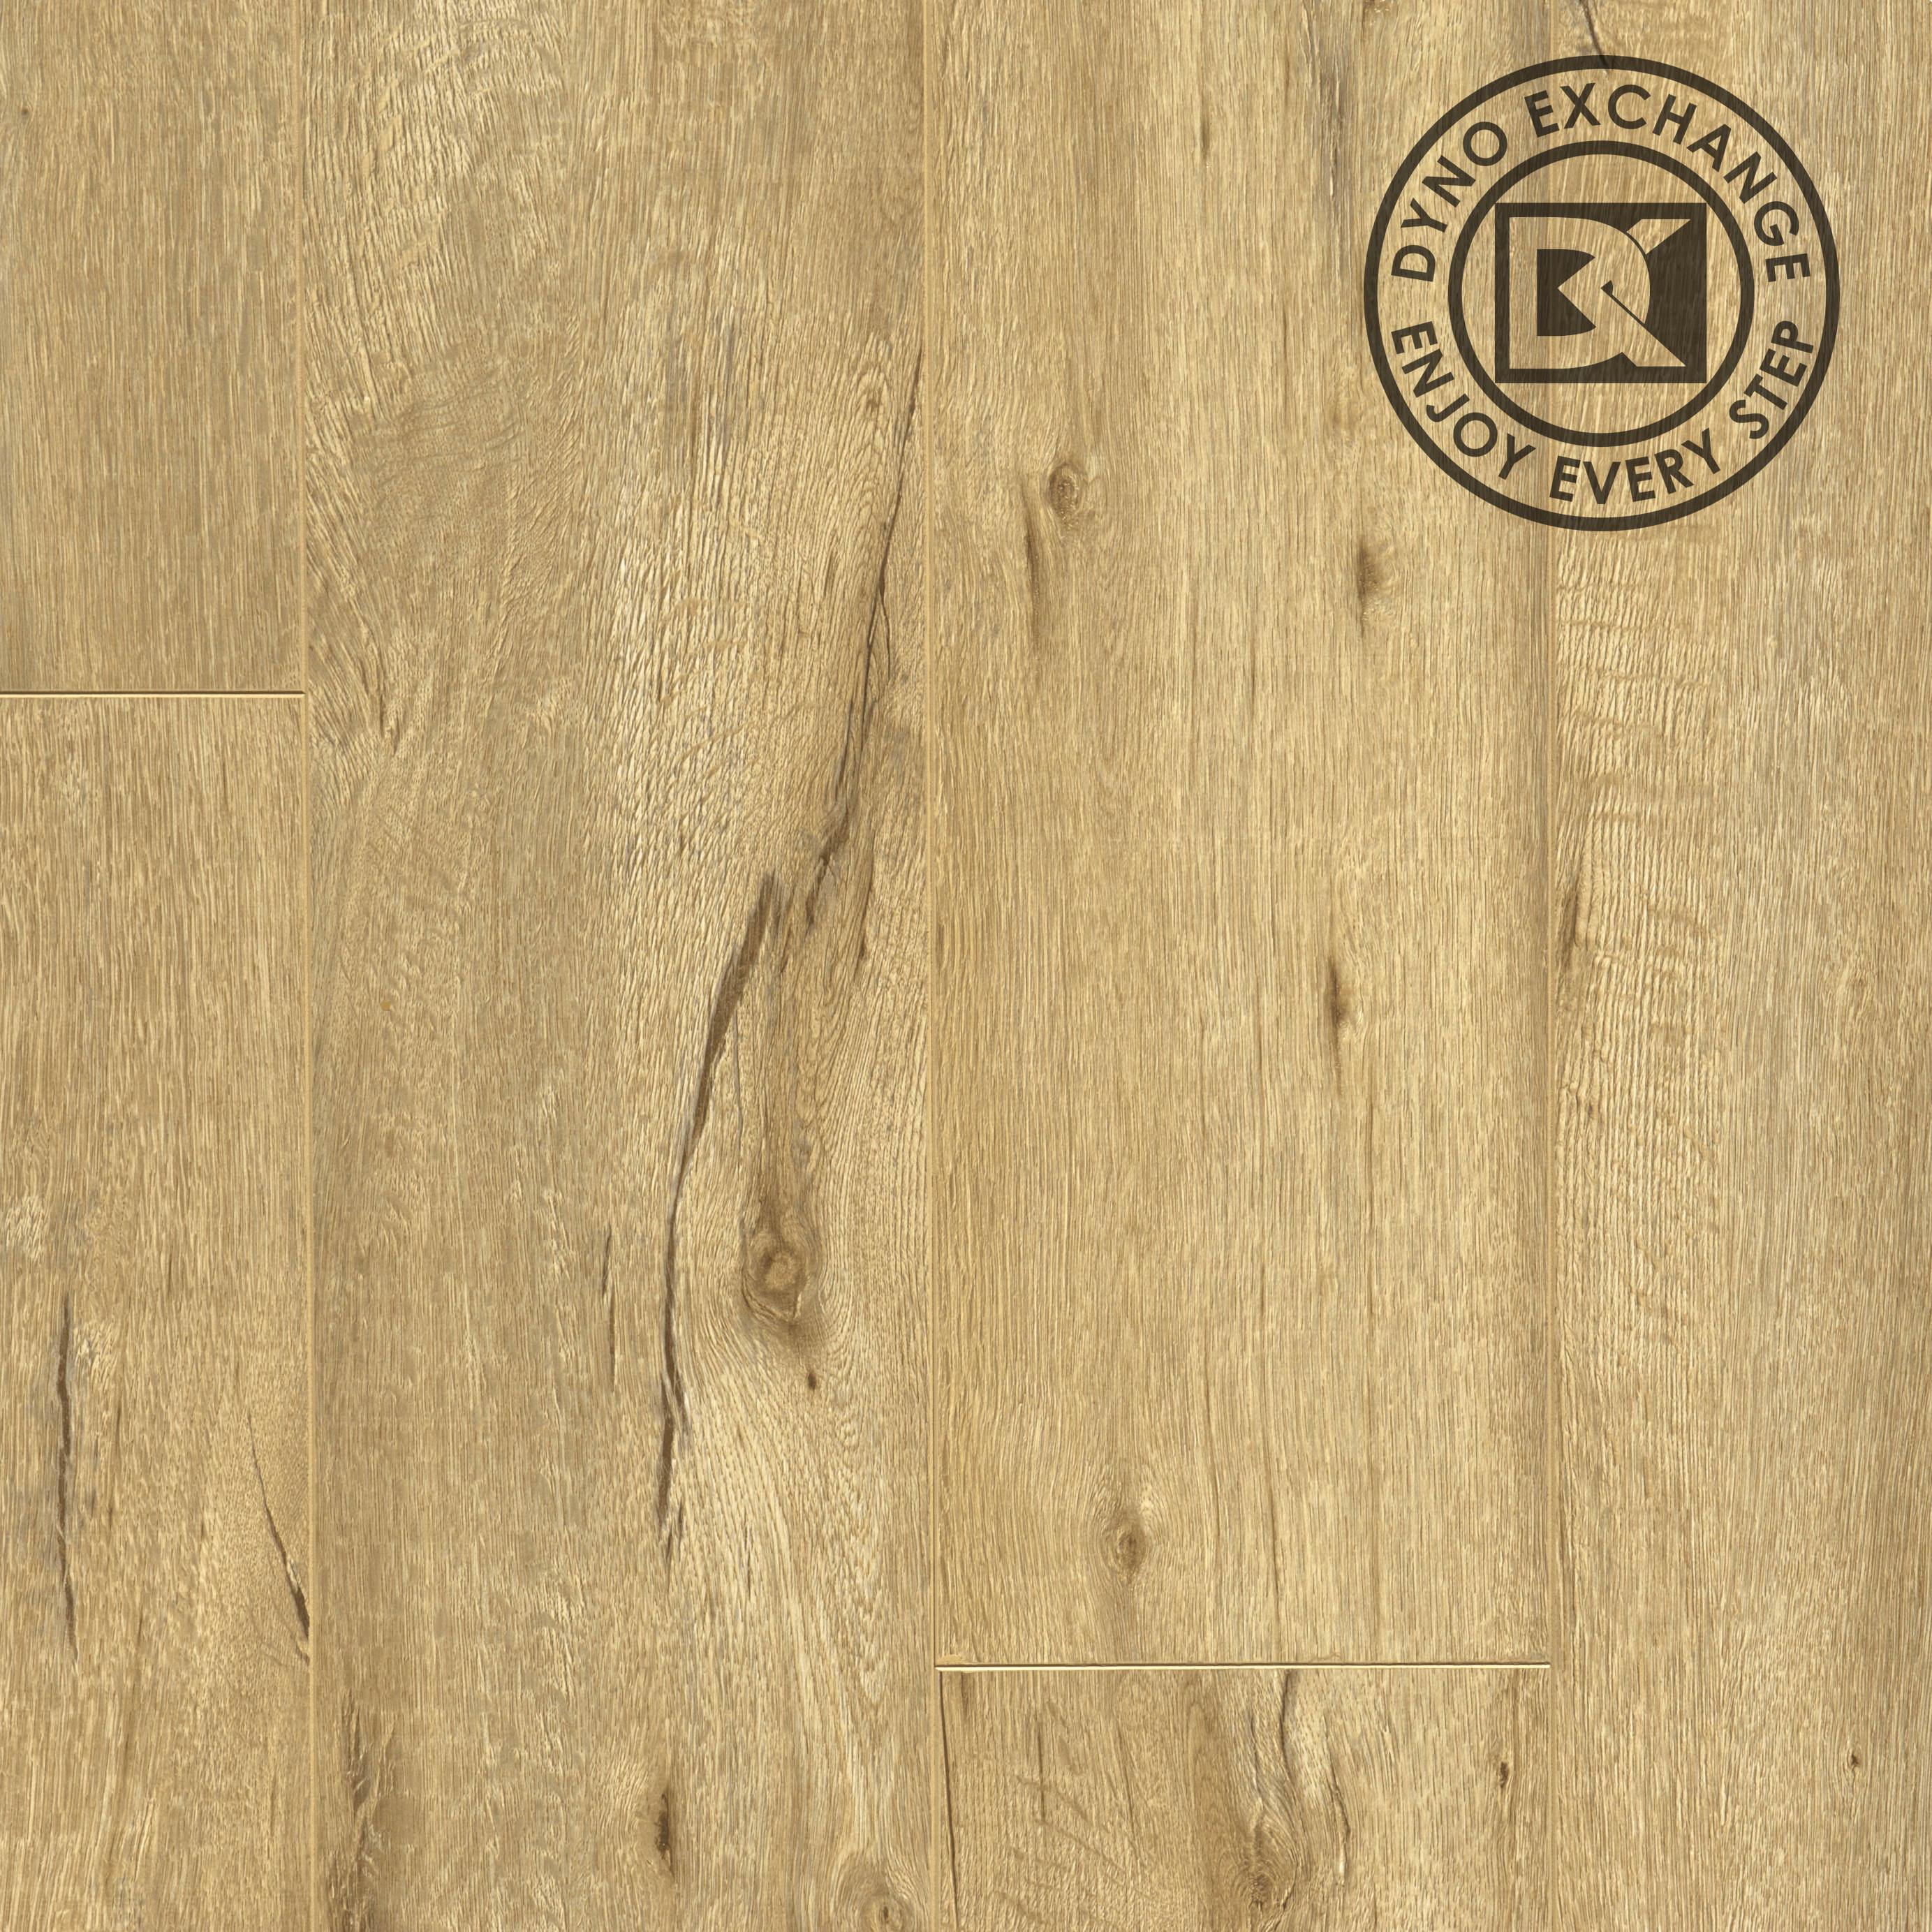 Dyno Exchange, Essence Collection Laminate Flooring, Hampton Beige (20.15 sqft/box)